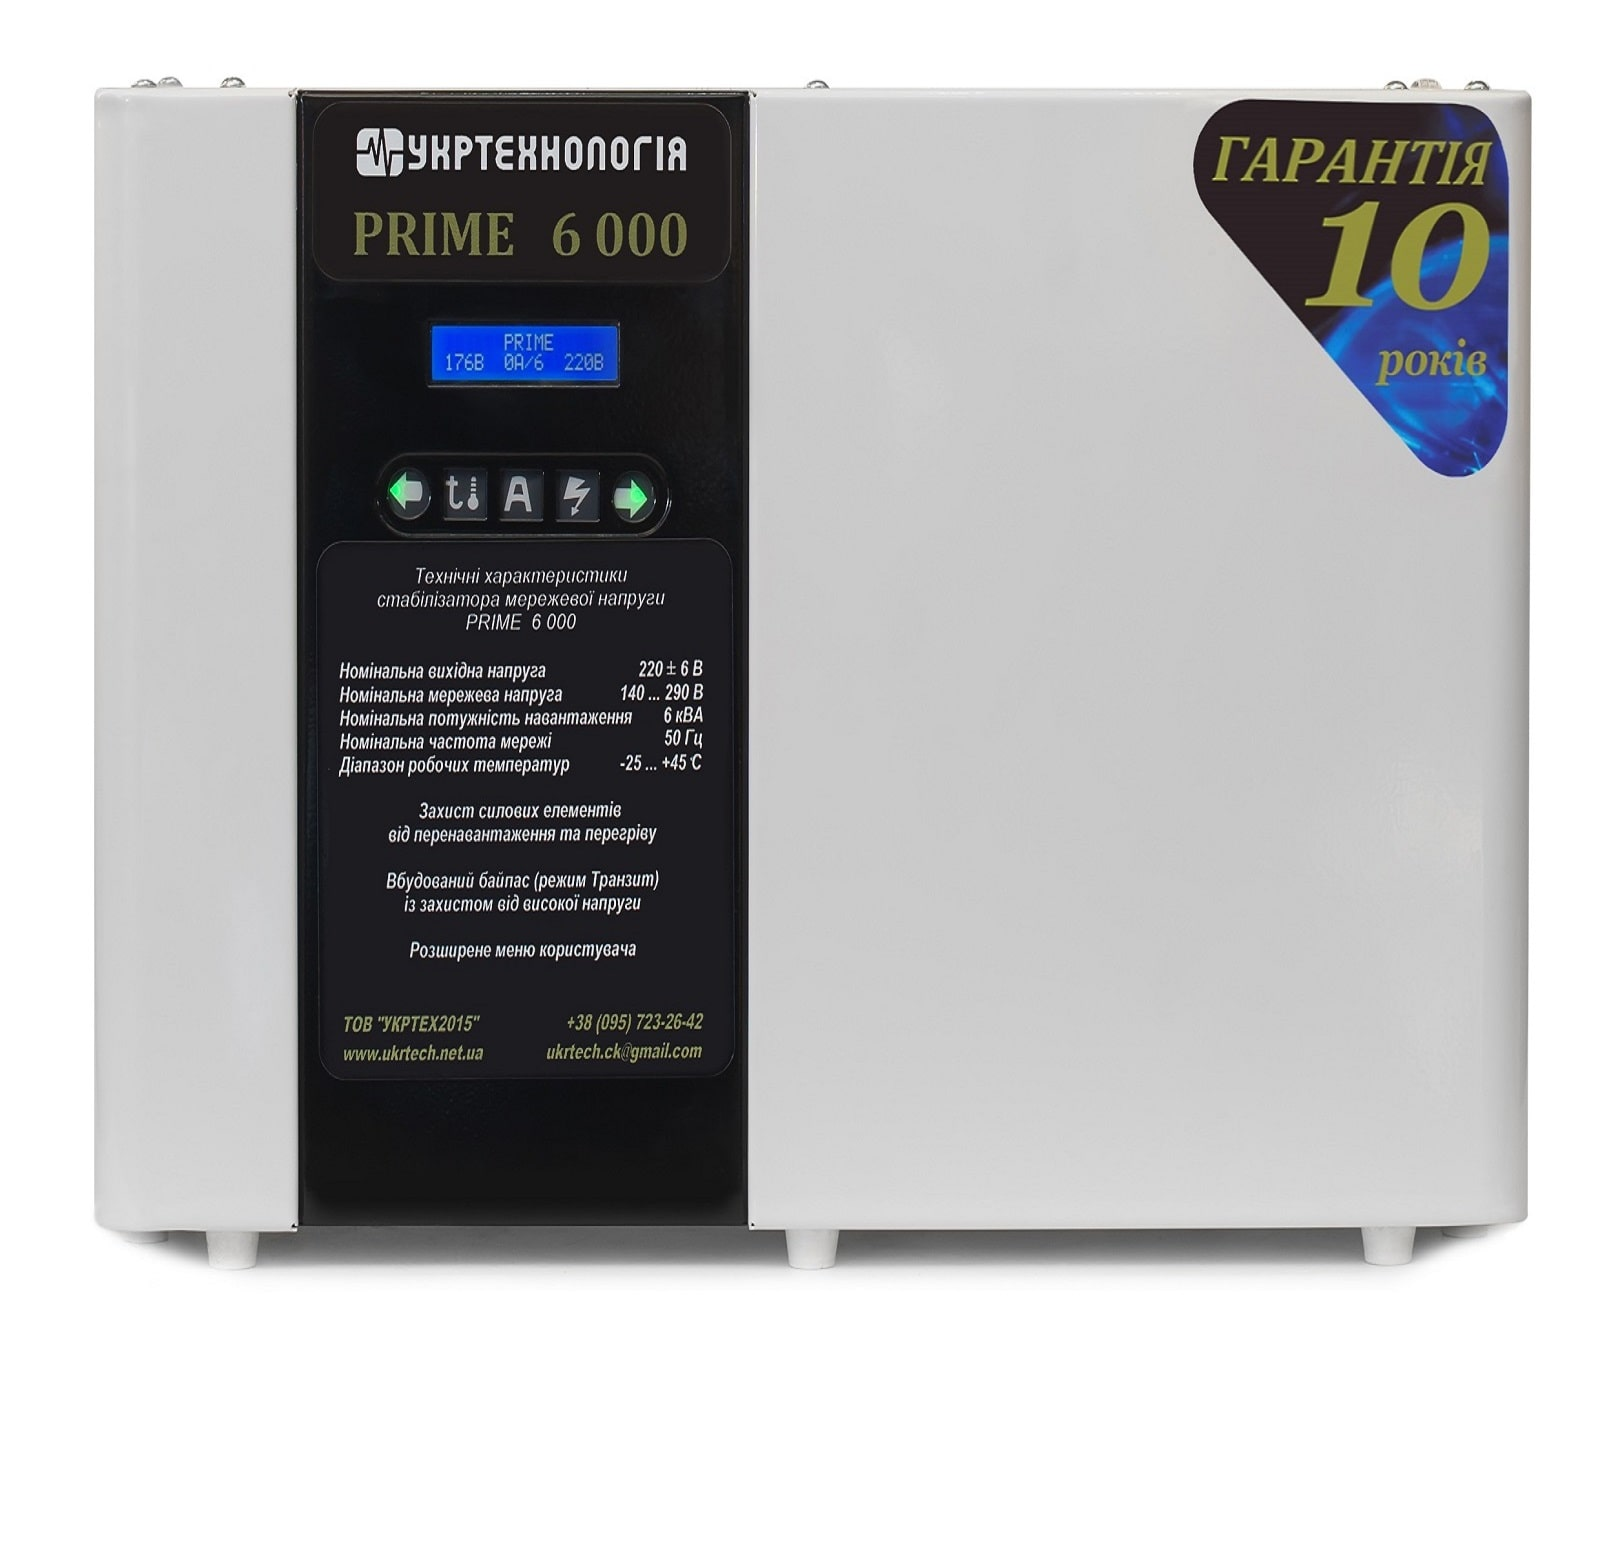 Стабилизаторы напряжения - Стабилизатор напряжения 6 кВт РRIME 000001453 - Фото 4